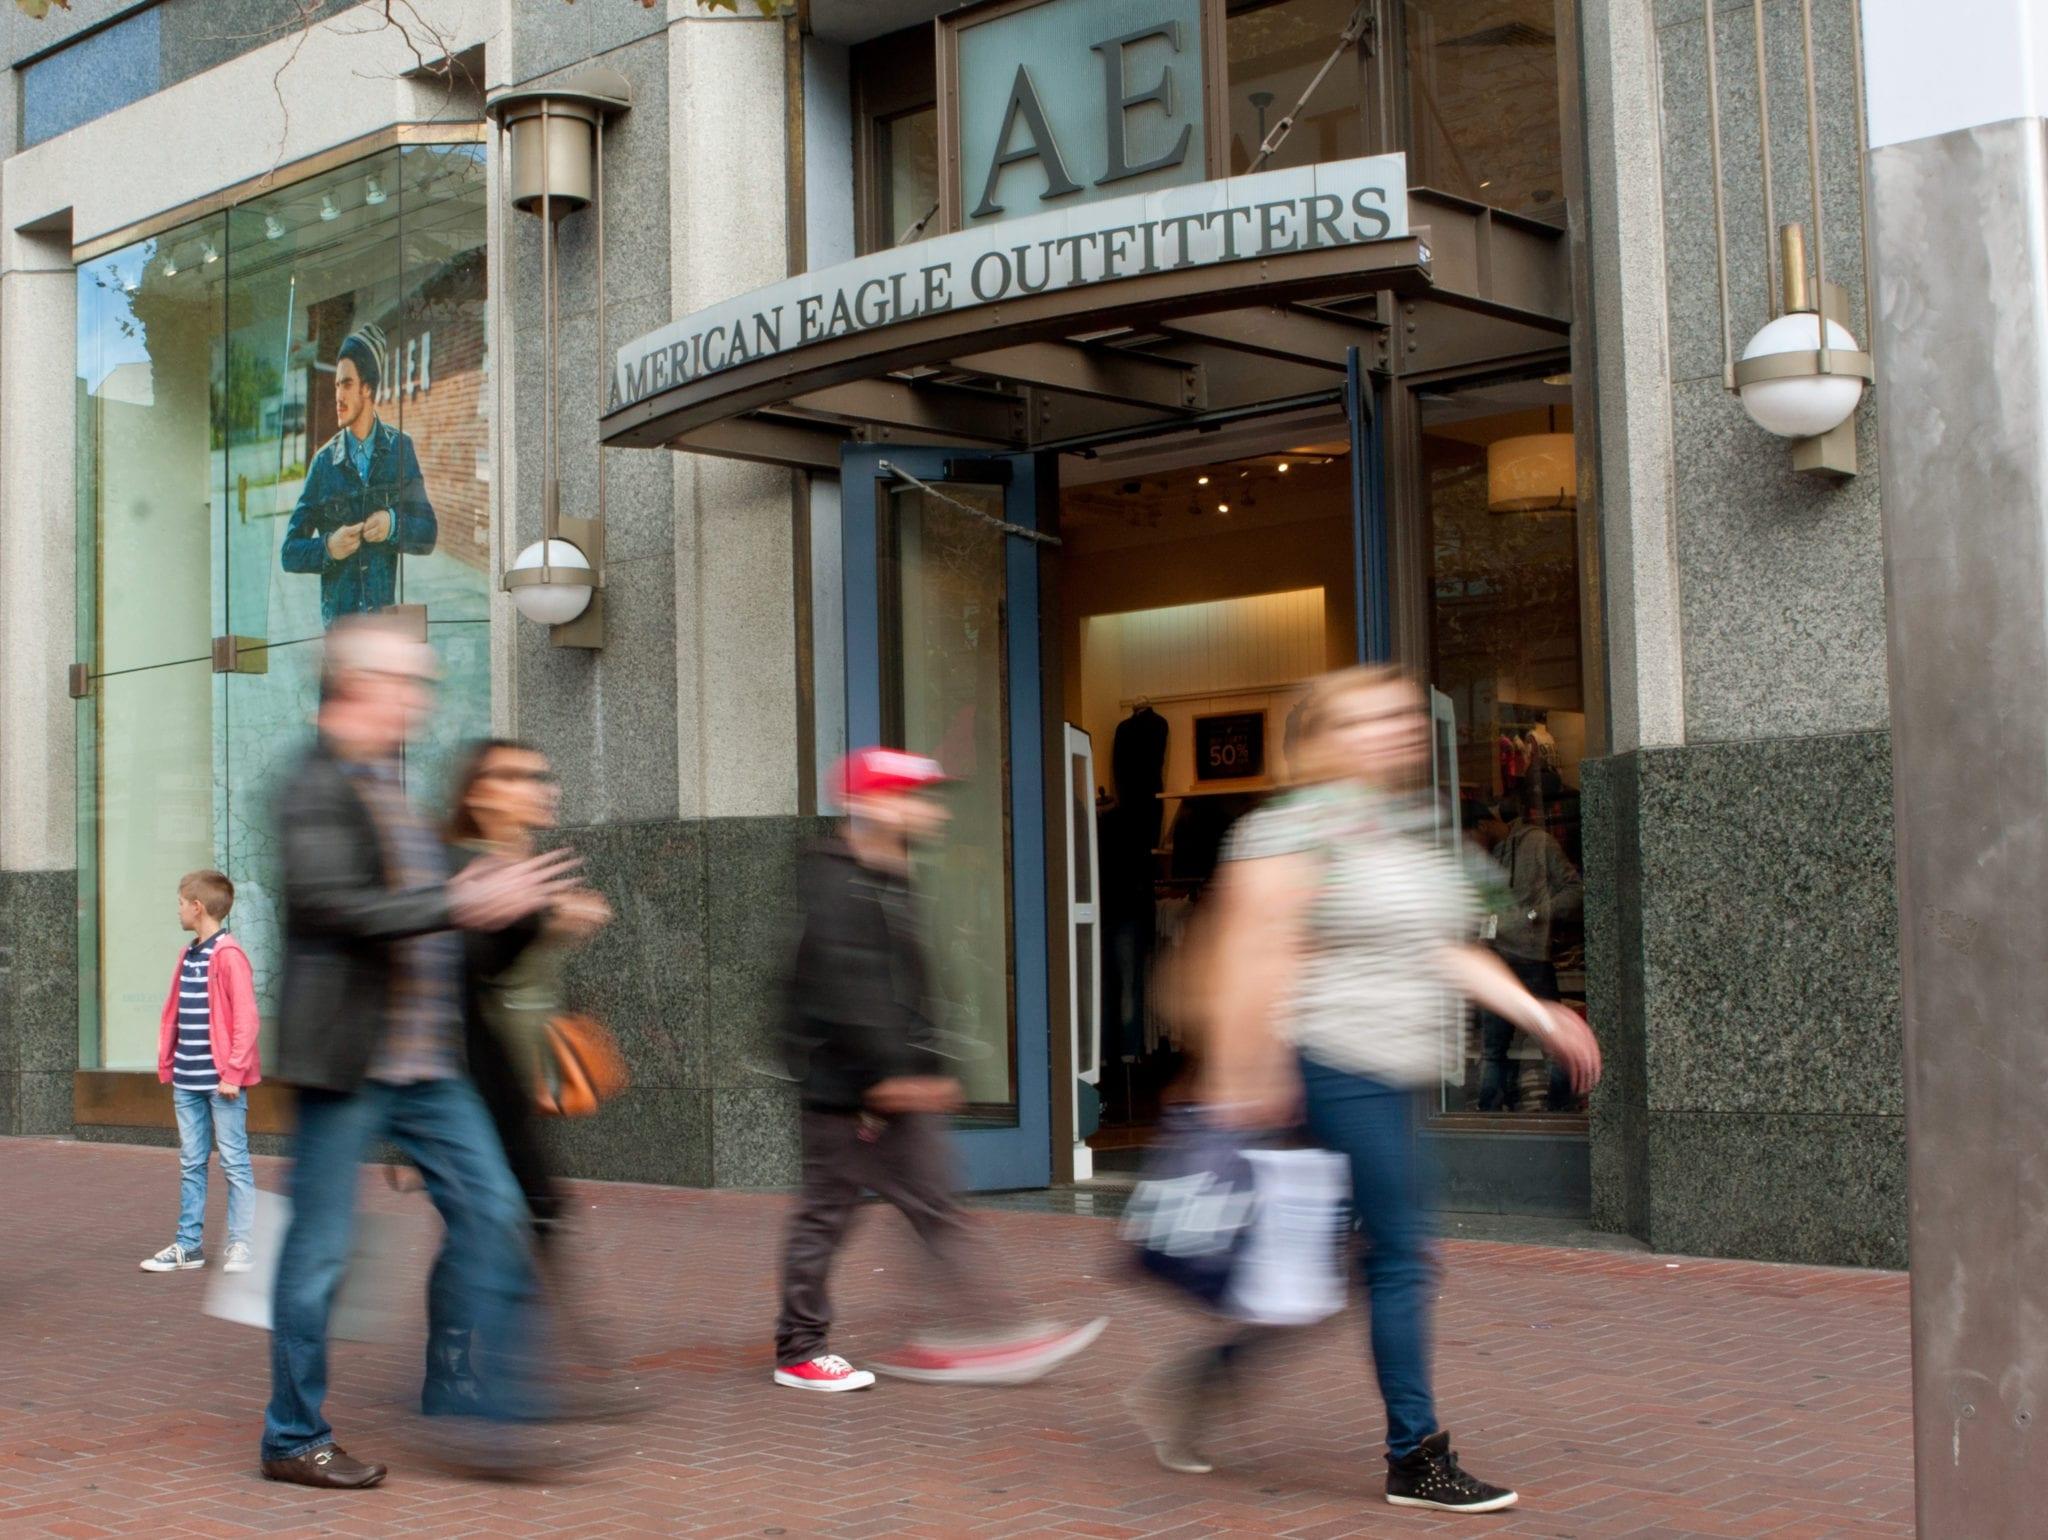 Green Growth Brands, American Eagle Strike CBD Deal